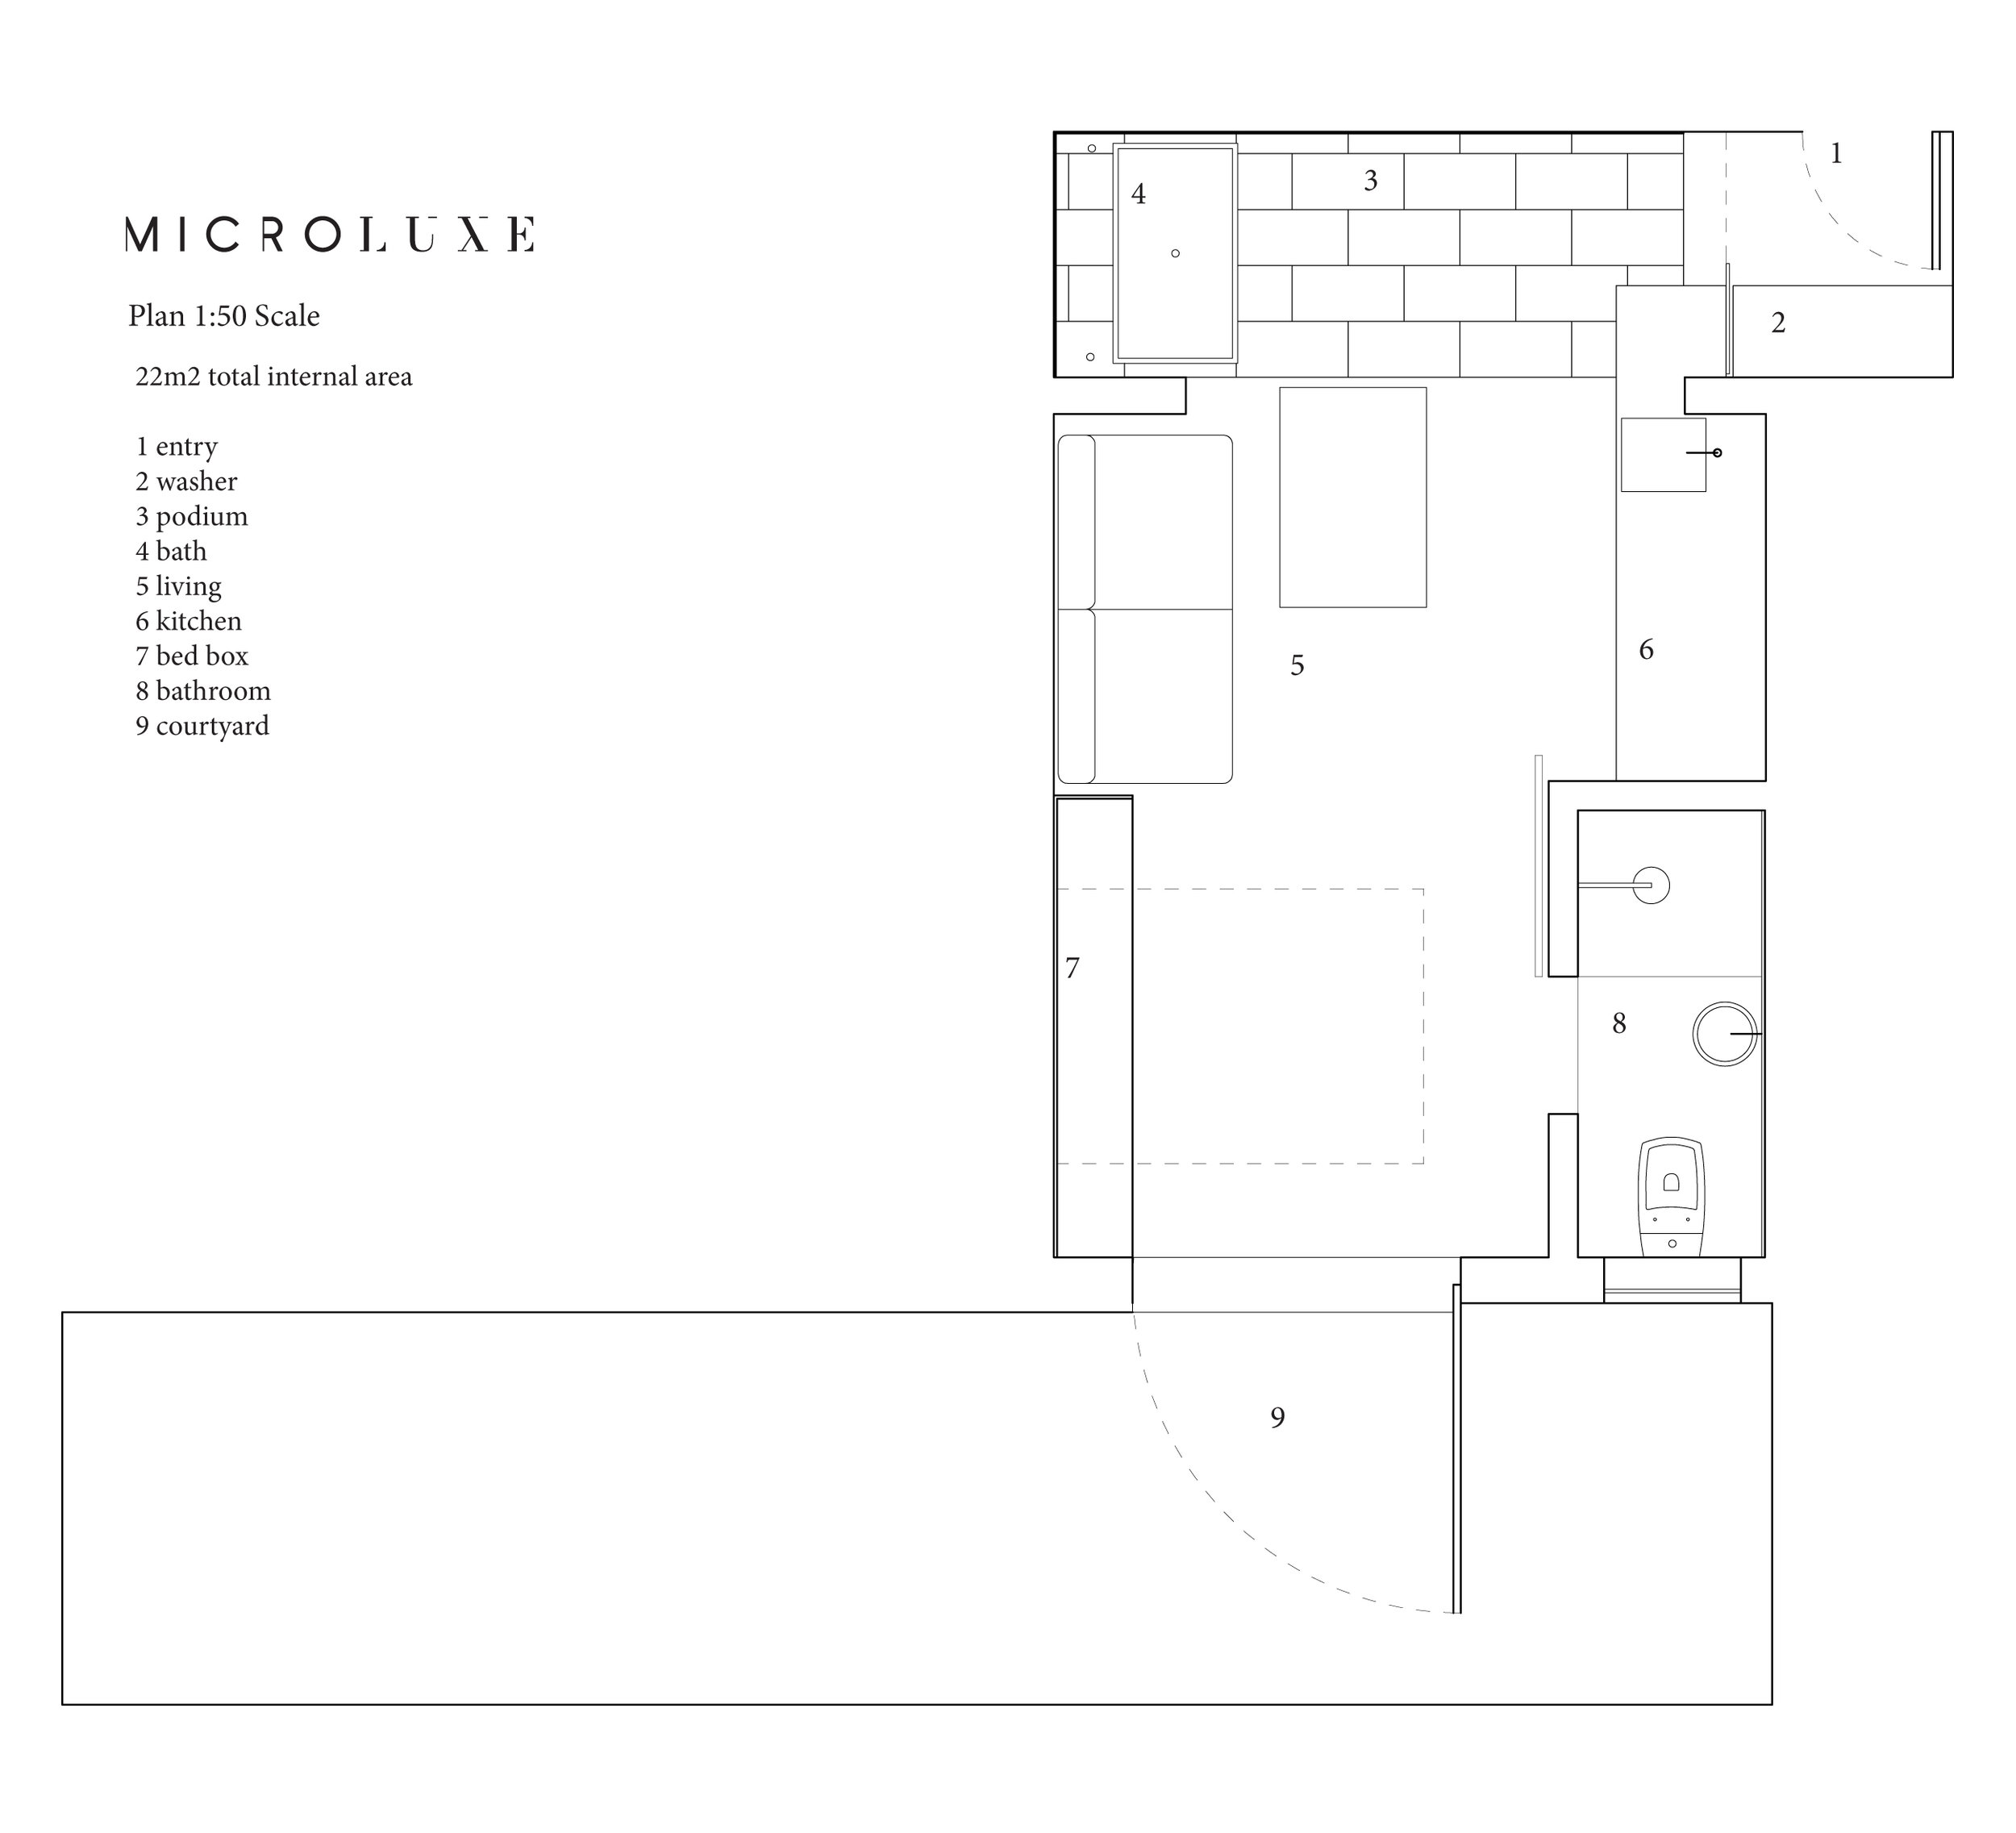 MLUXE 1_50 plan.jpg